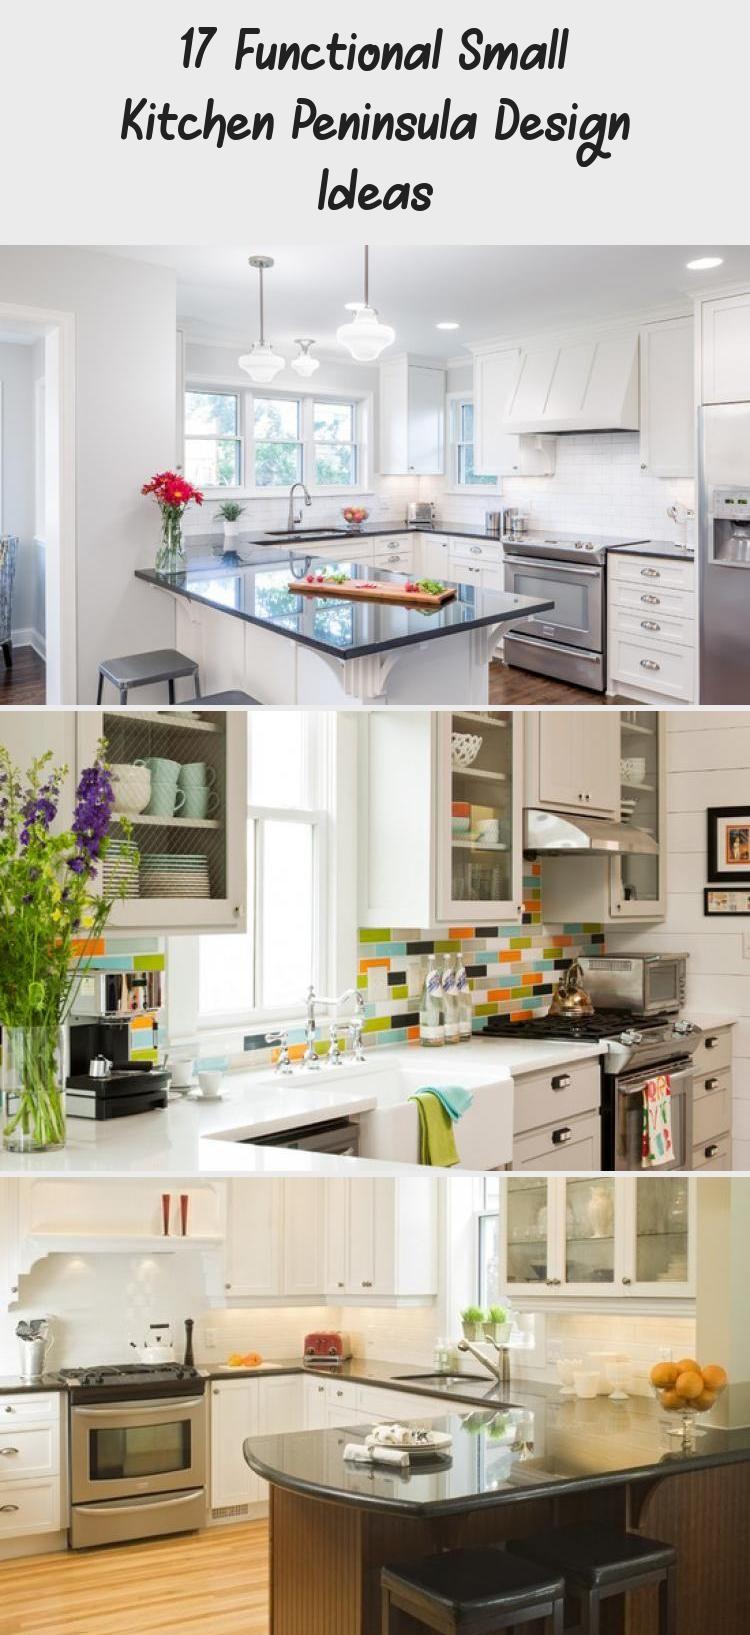 17 Functional Small Kitchen Peninsula Design Ideas